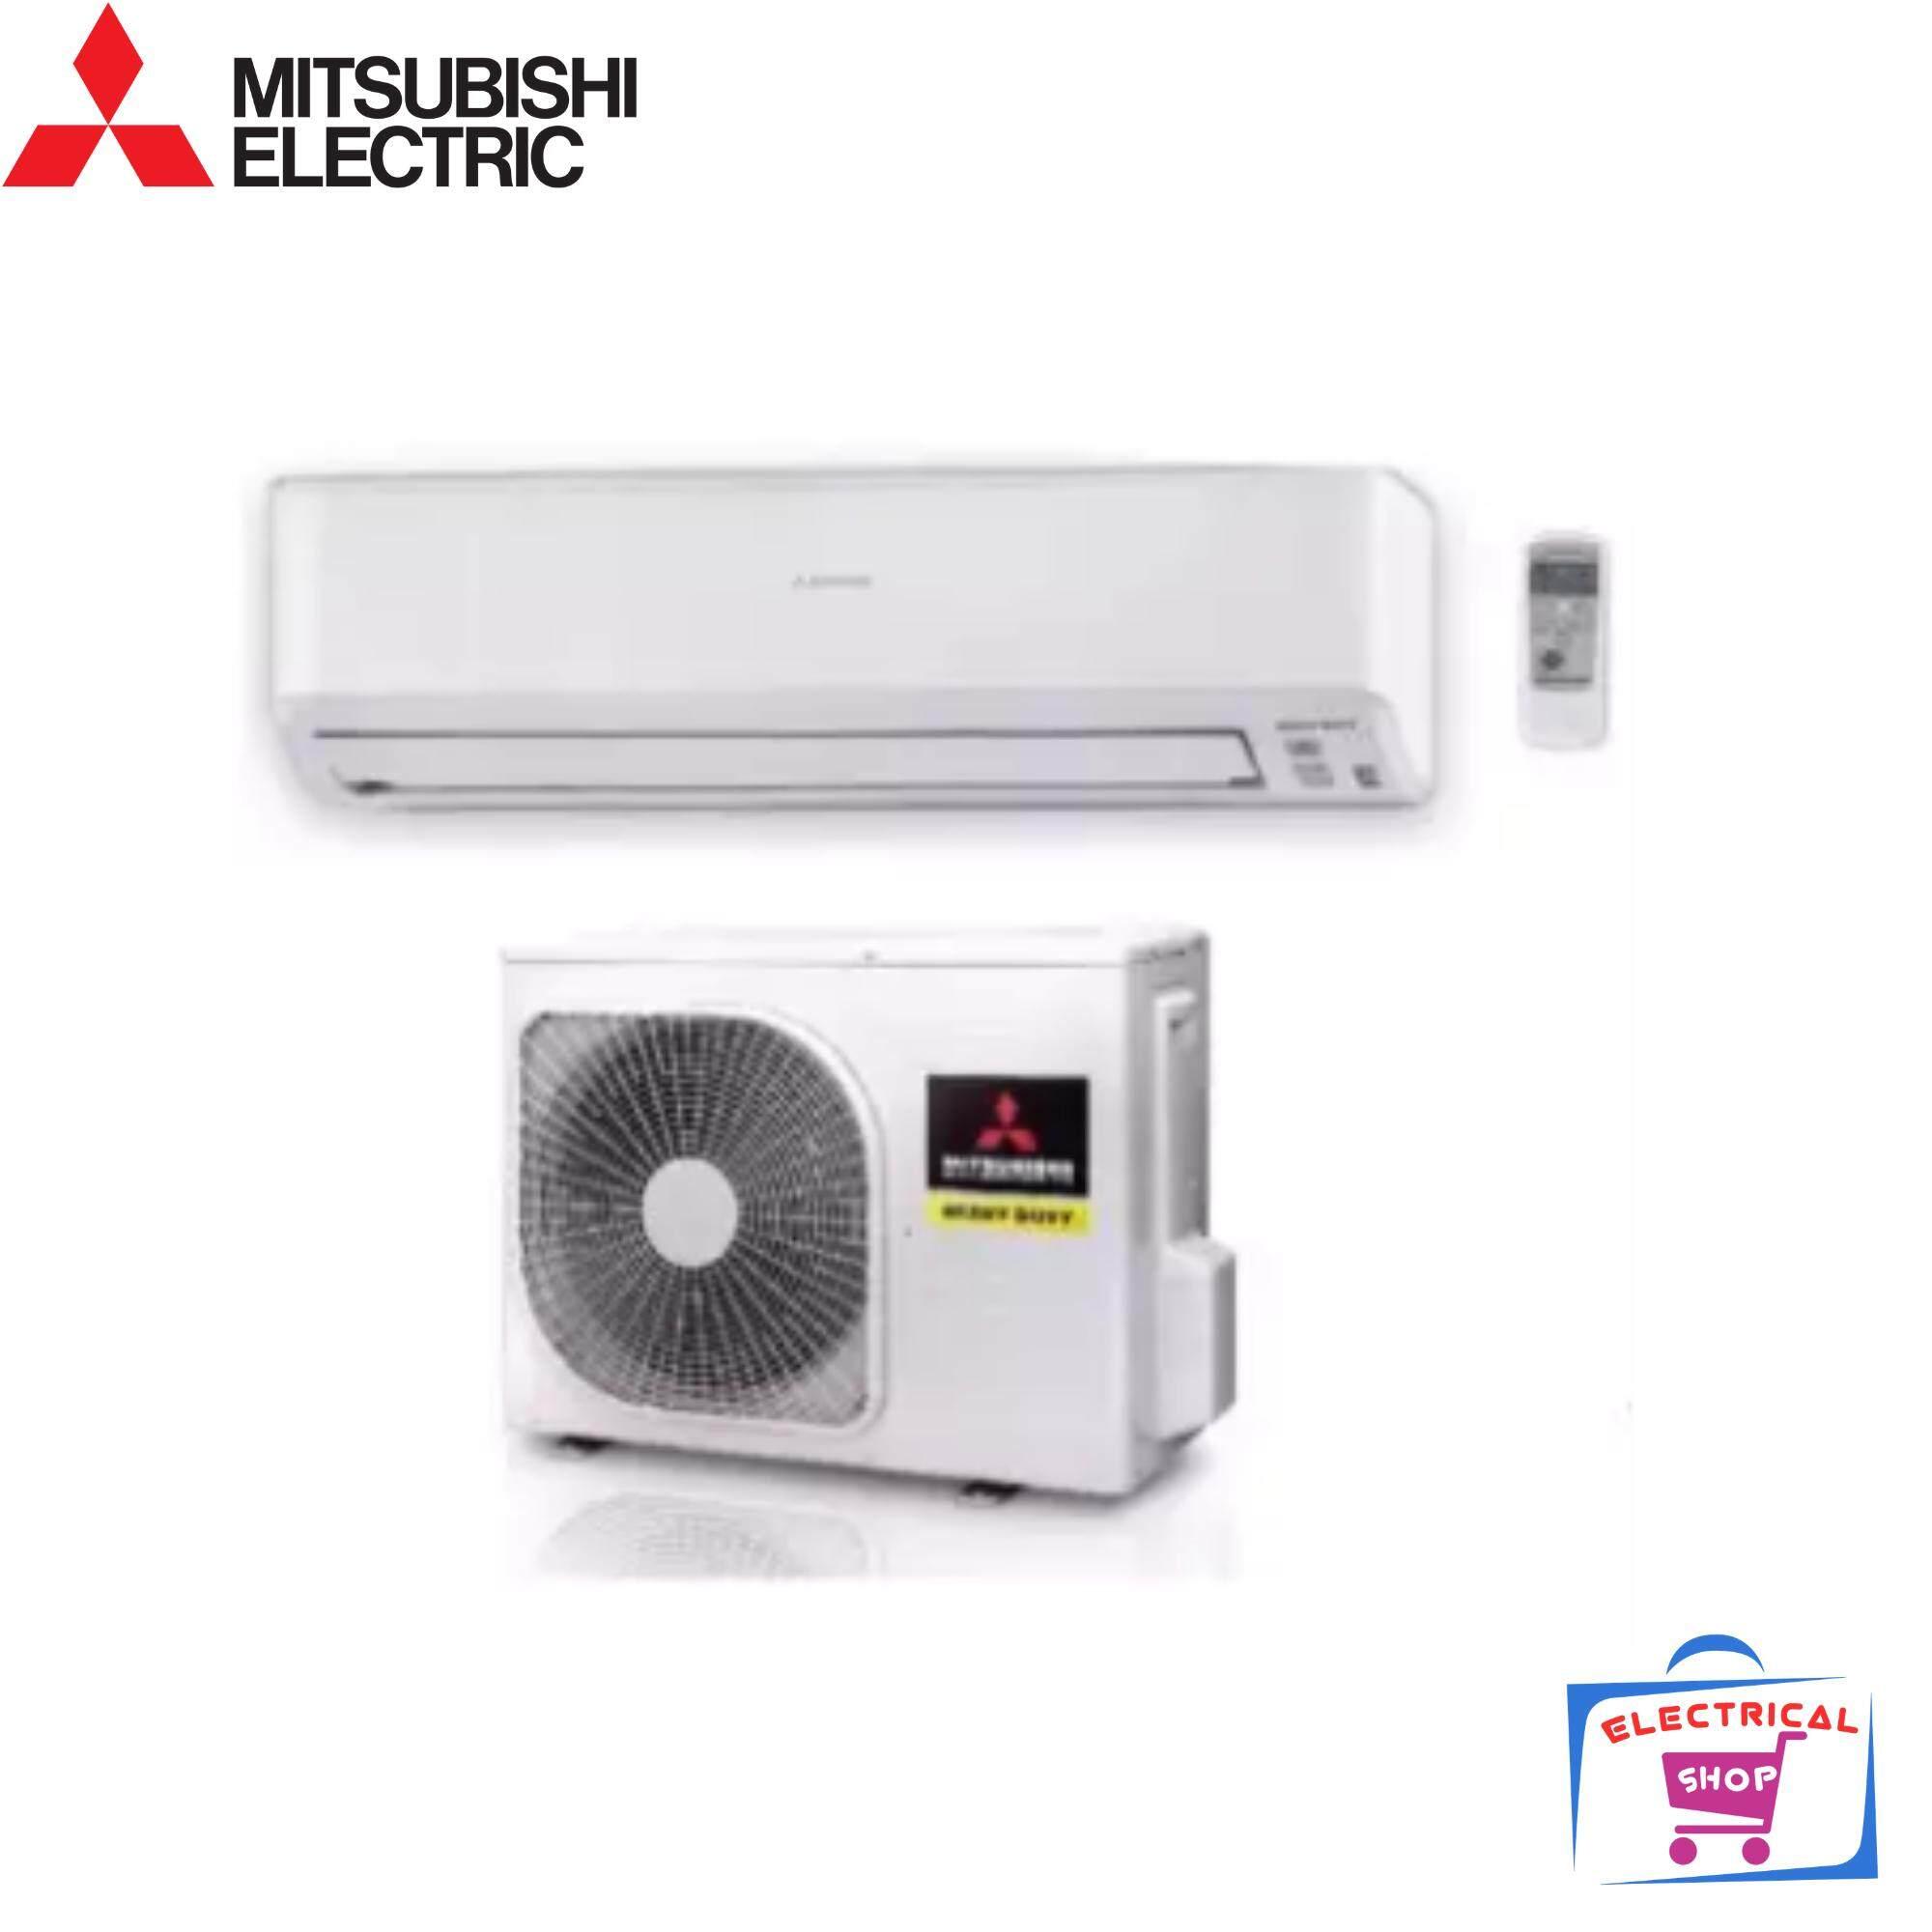 mitsubishi air conditioner price in malaysia - best mitsubishi air